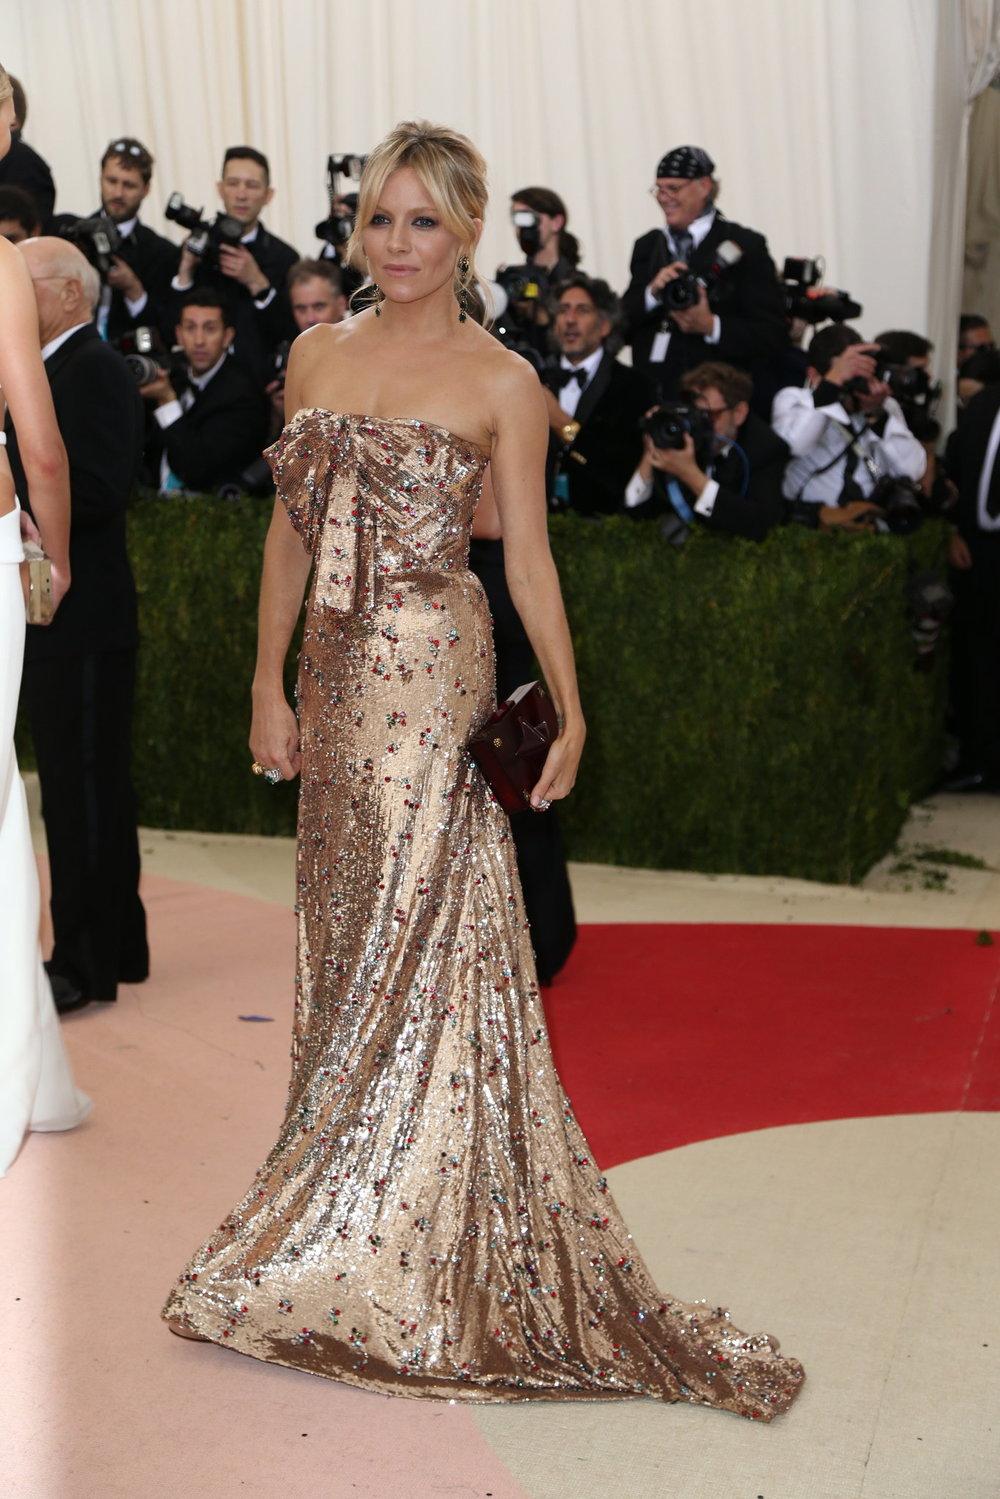 Sienna Miller in Custom Gucci